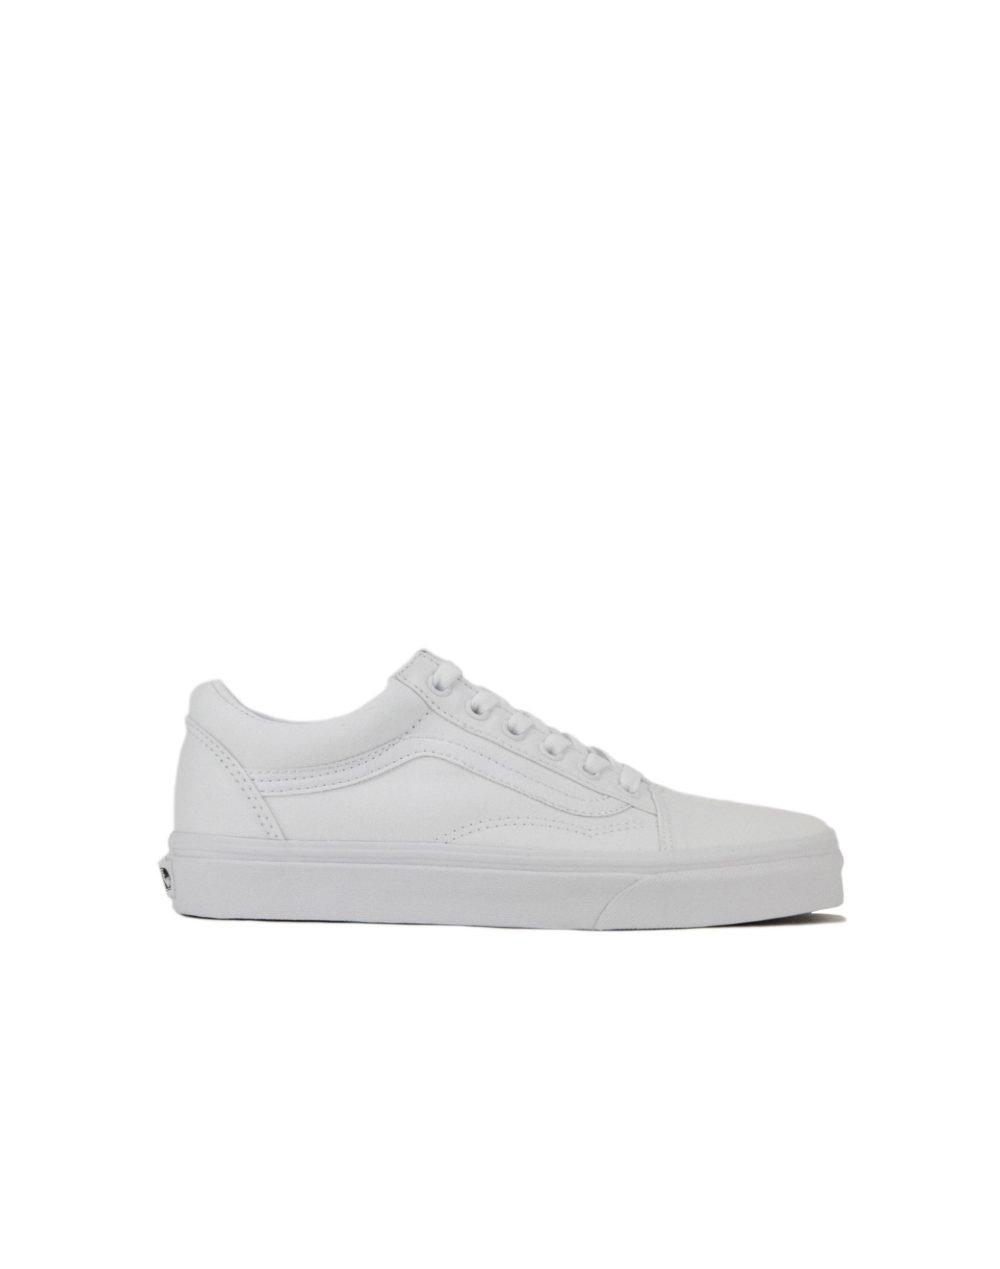 Vans Old Skool (VN000D3HW001) True White